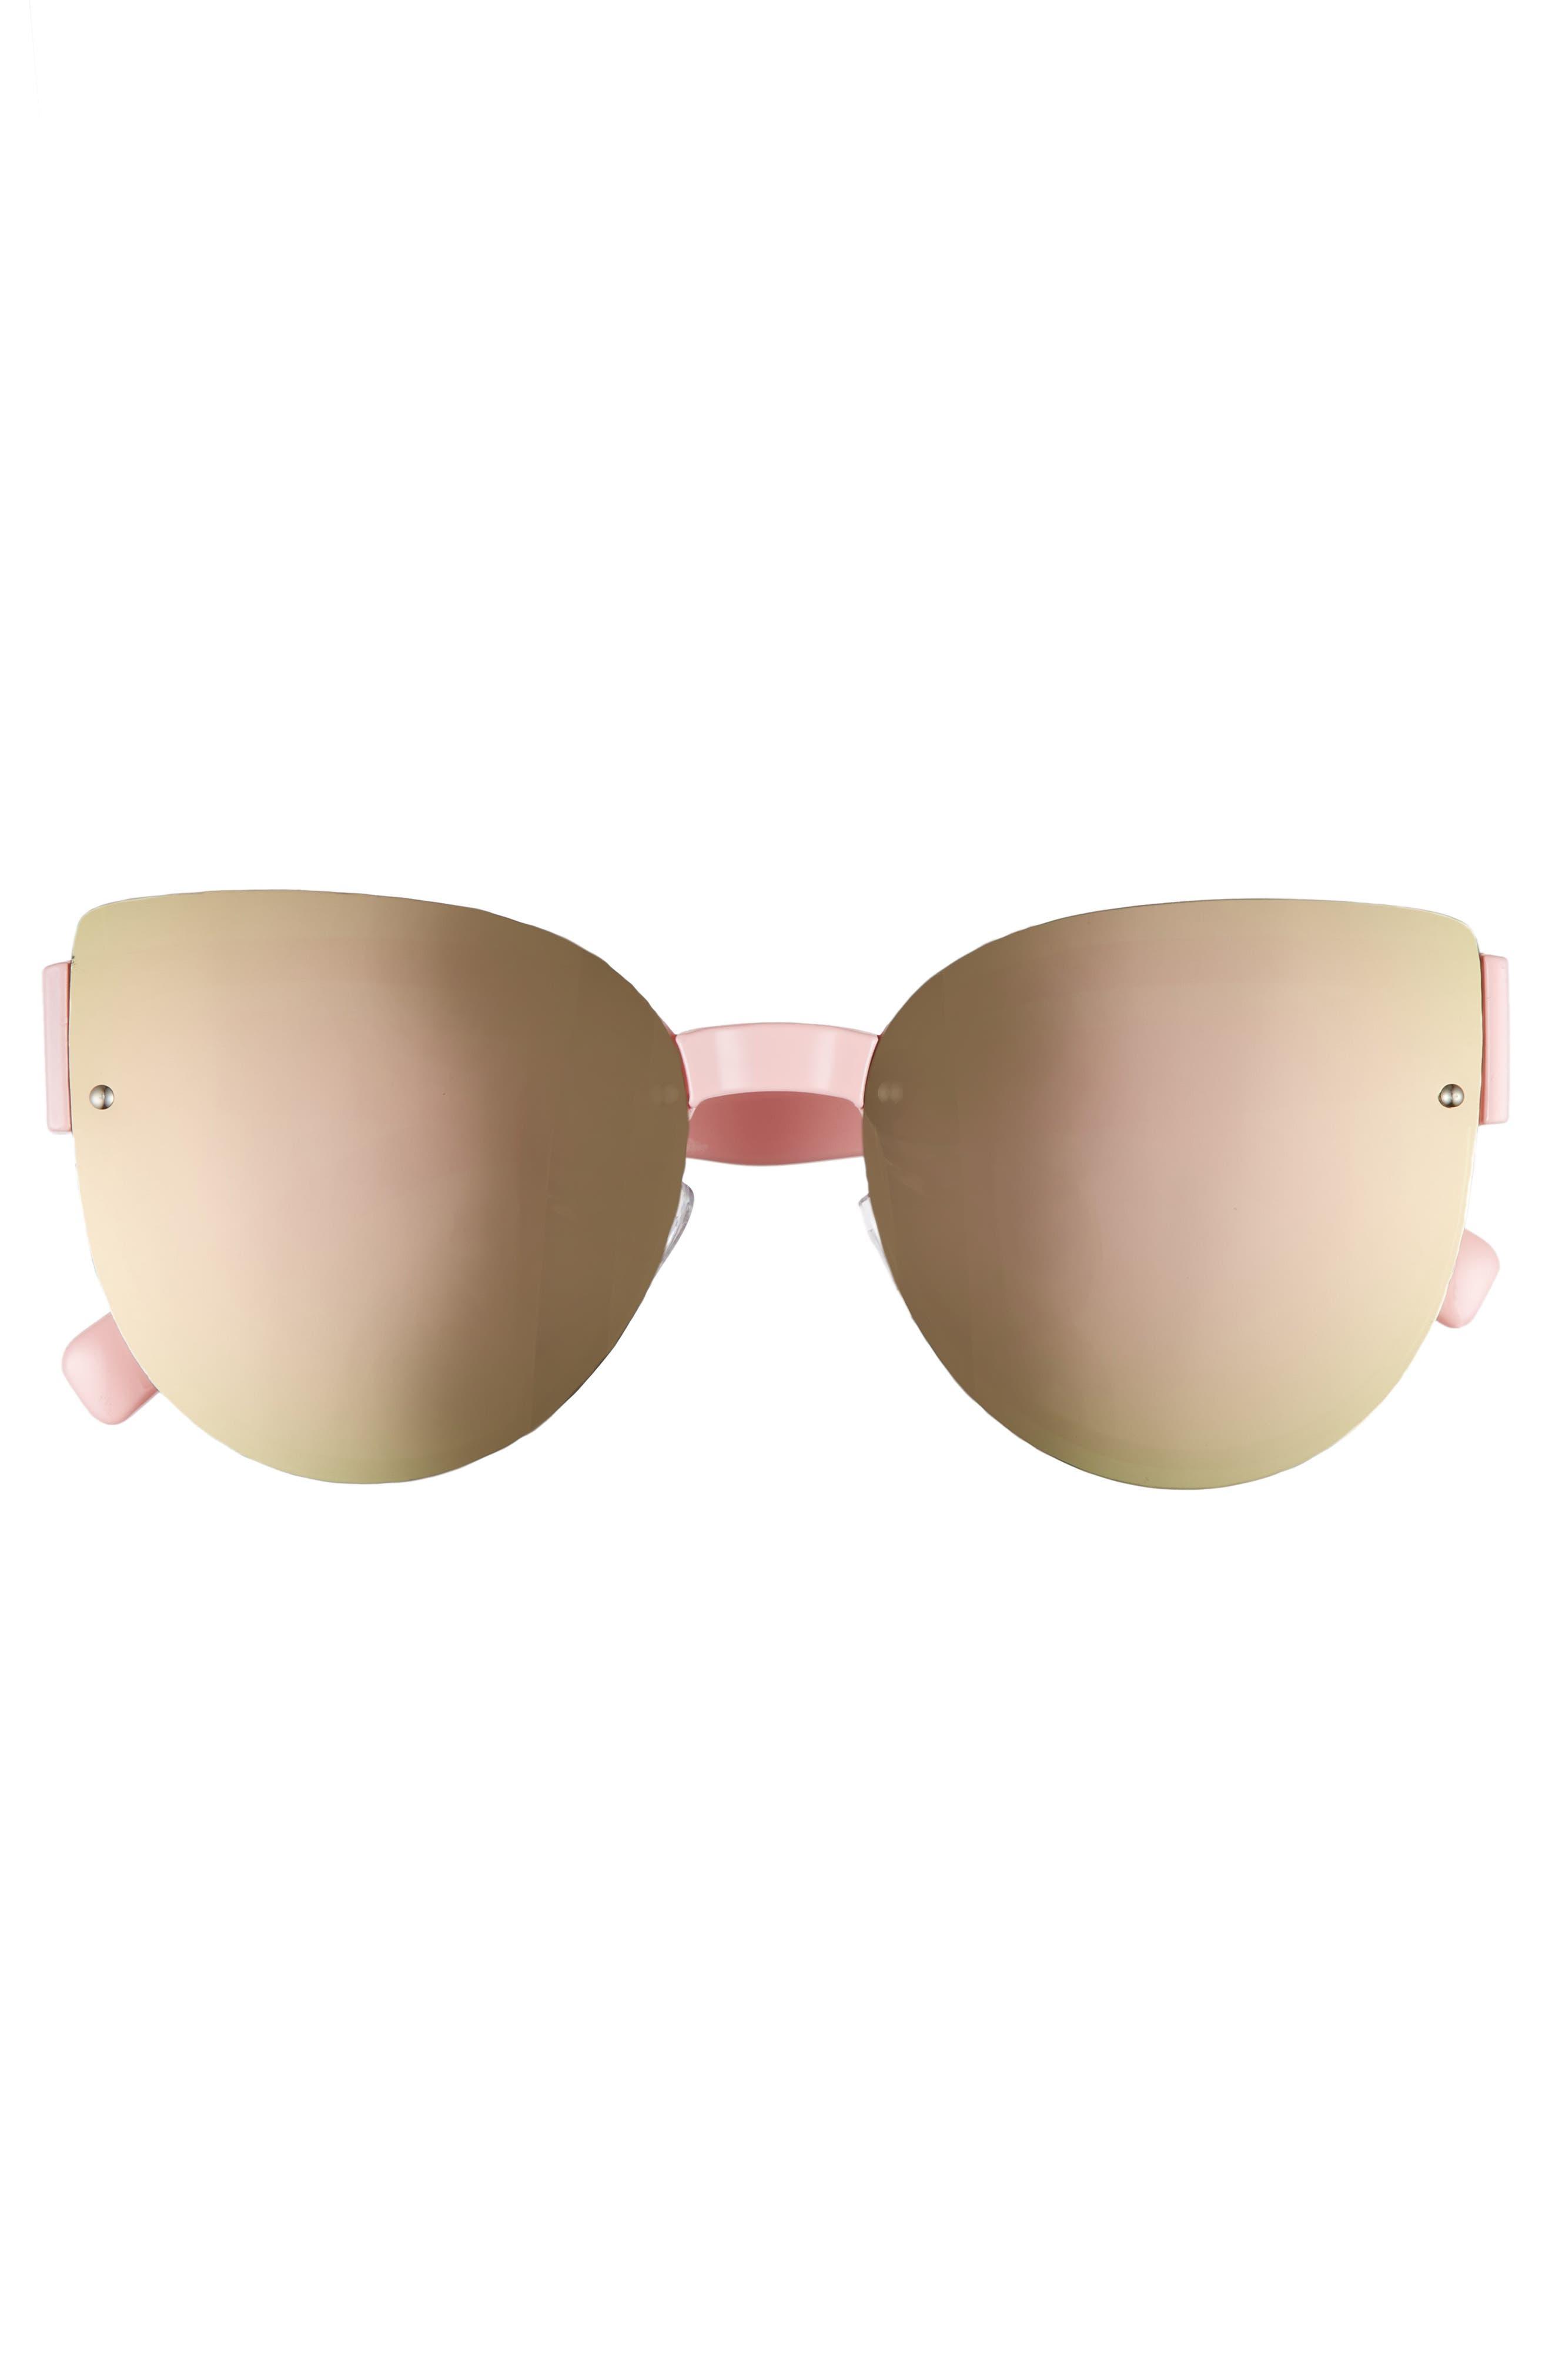 62mm Oversize Rimless Cat Eye Sunglasses,                             Alternate thumbnail 3, color,                             Pink